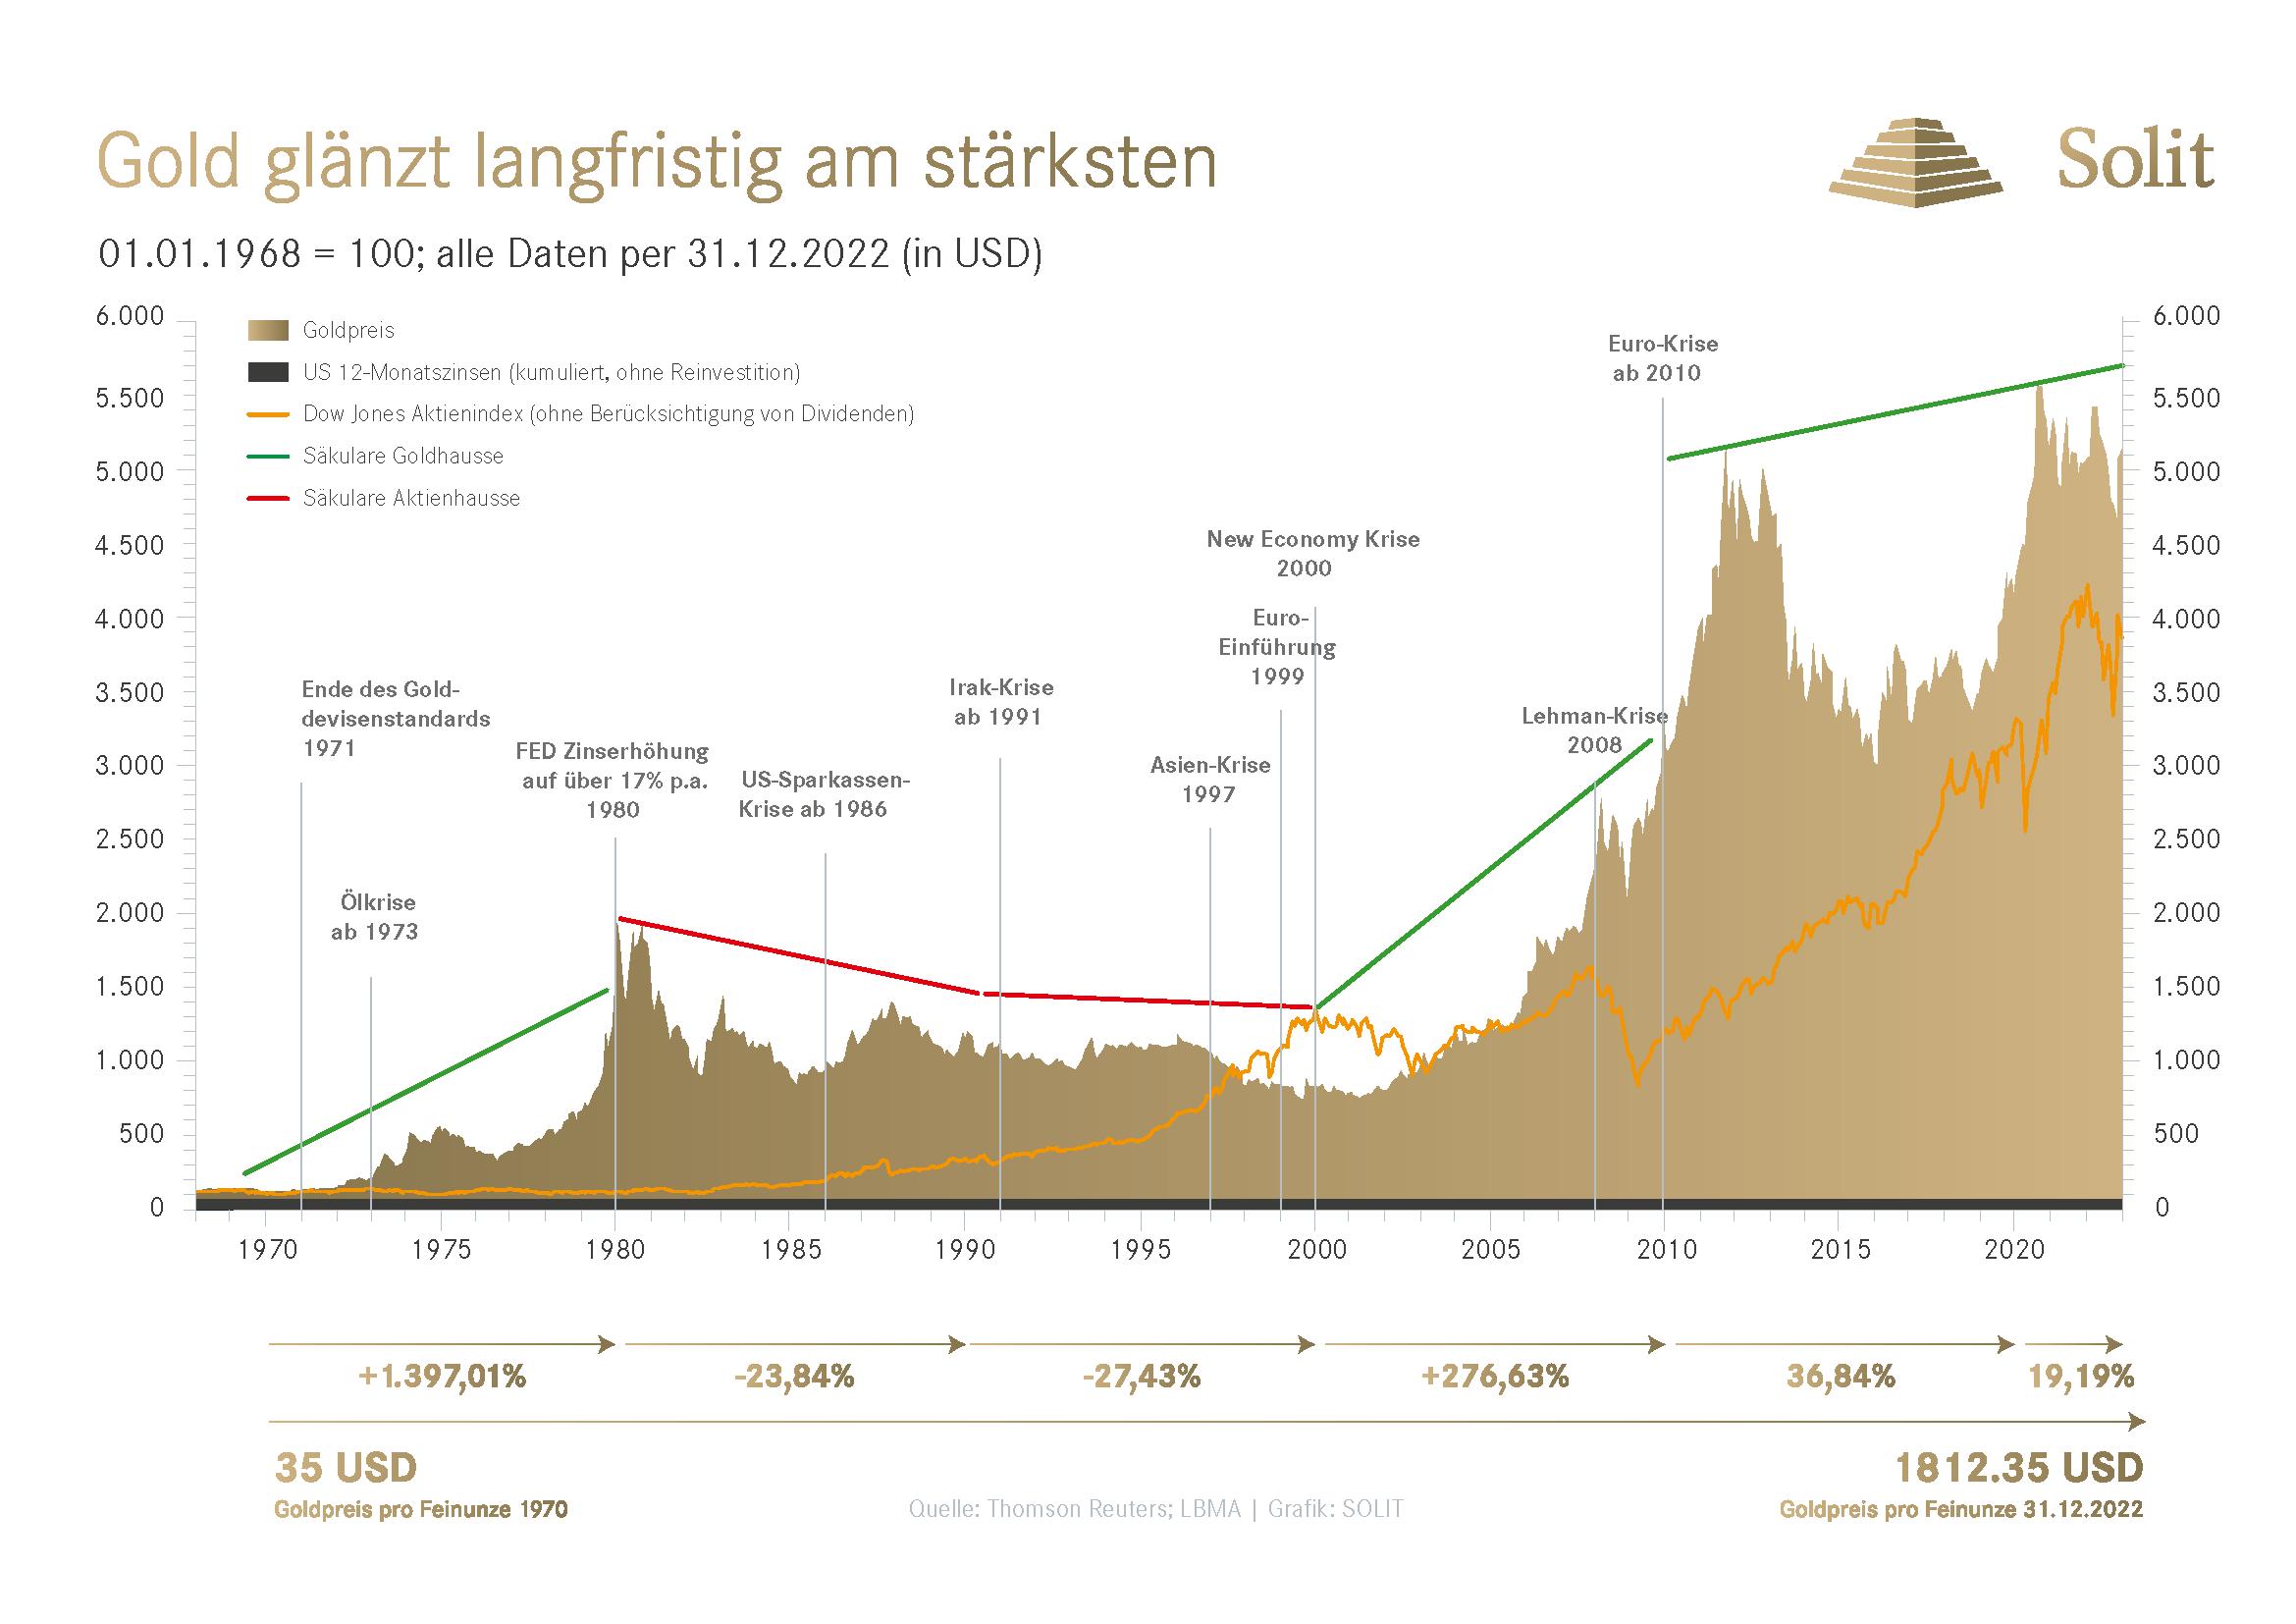 Langzeitchart - Goldkurs in USD